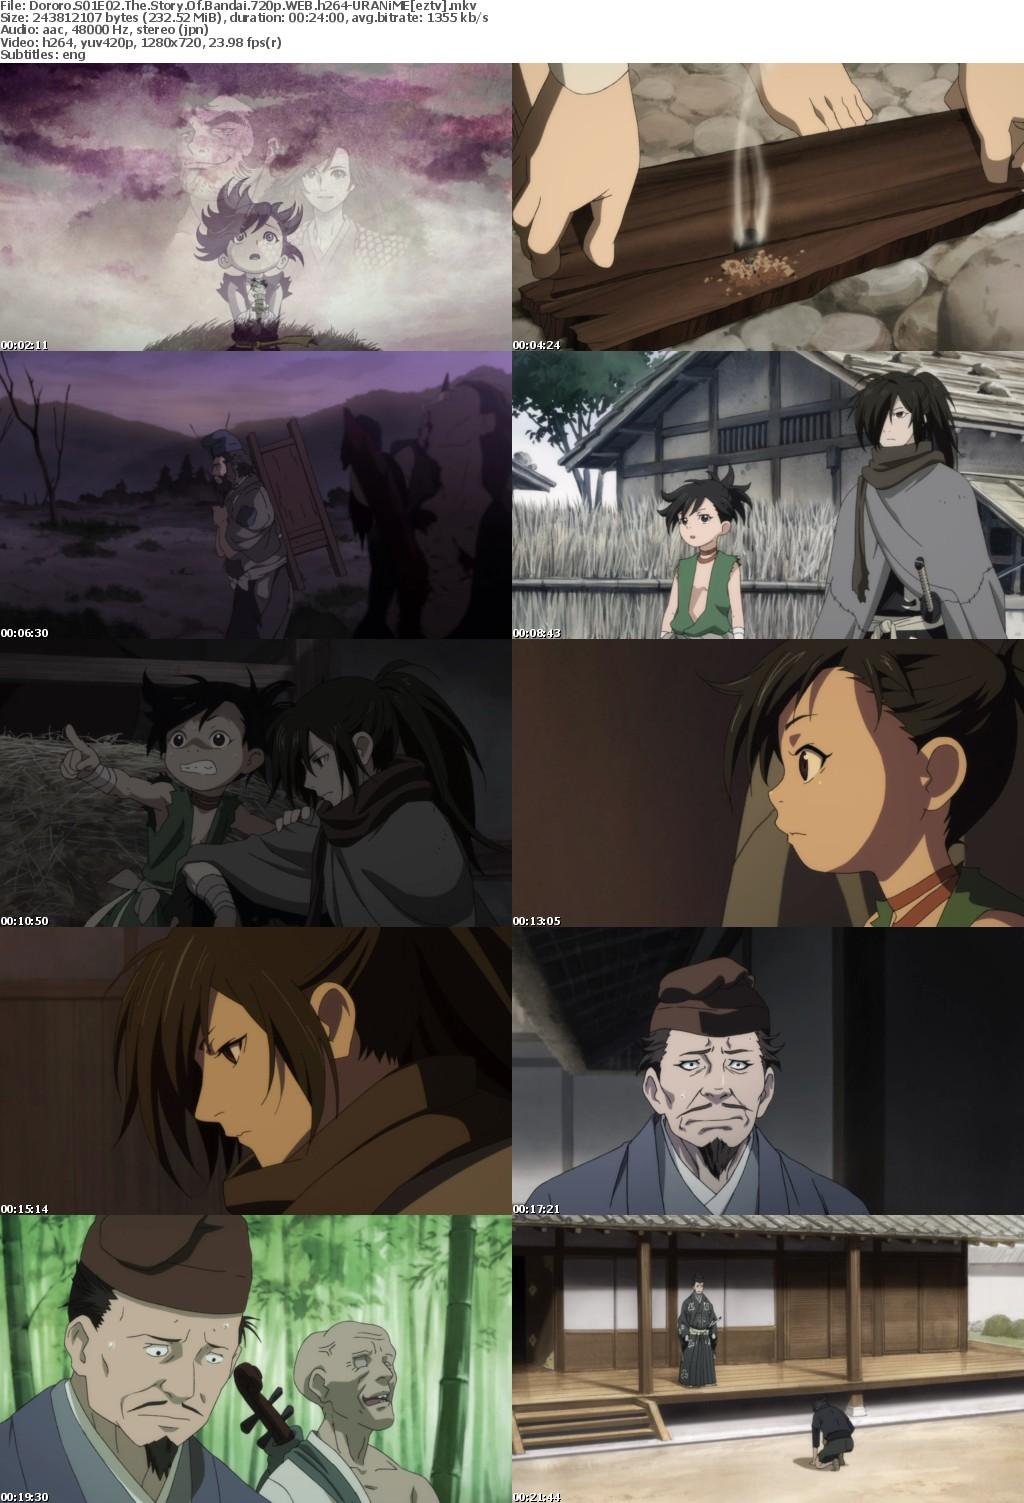 Dororo S01E02 The Story Of Bandai 720p WEB h264-URANiME